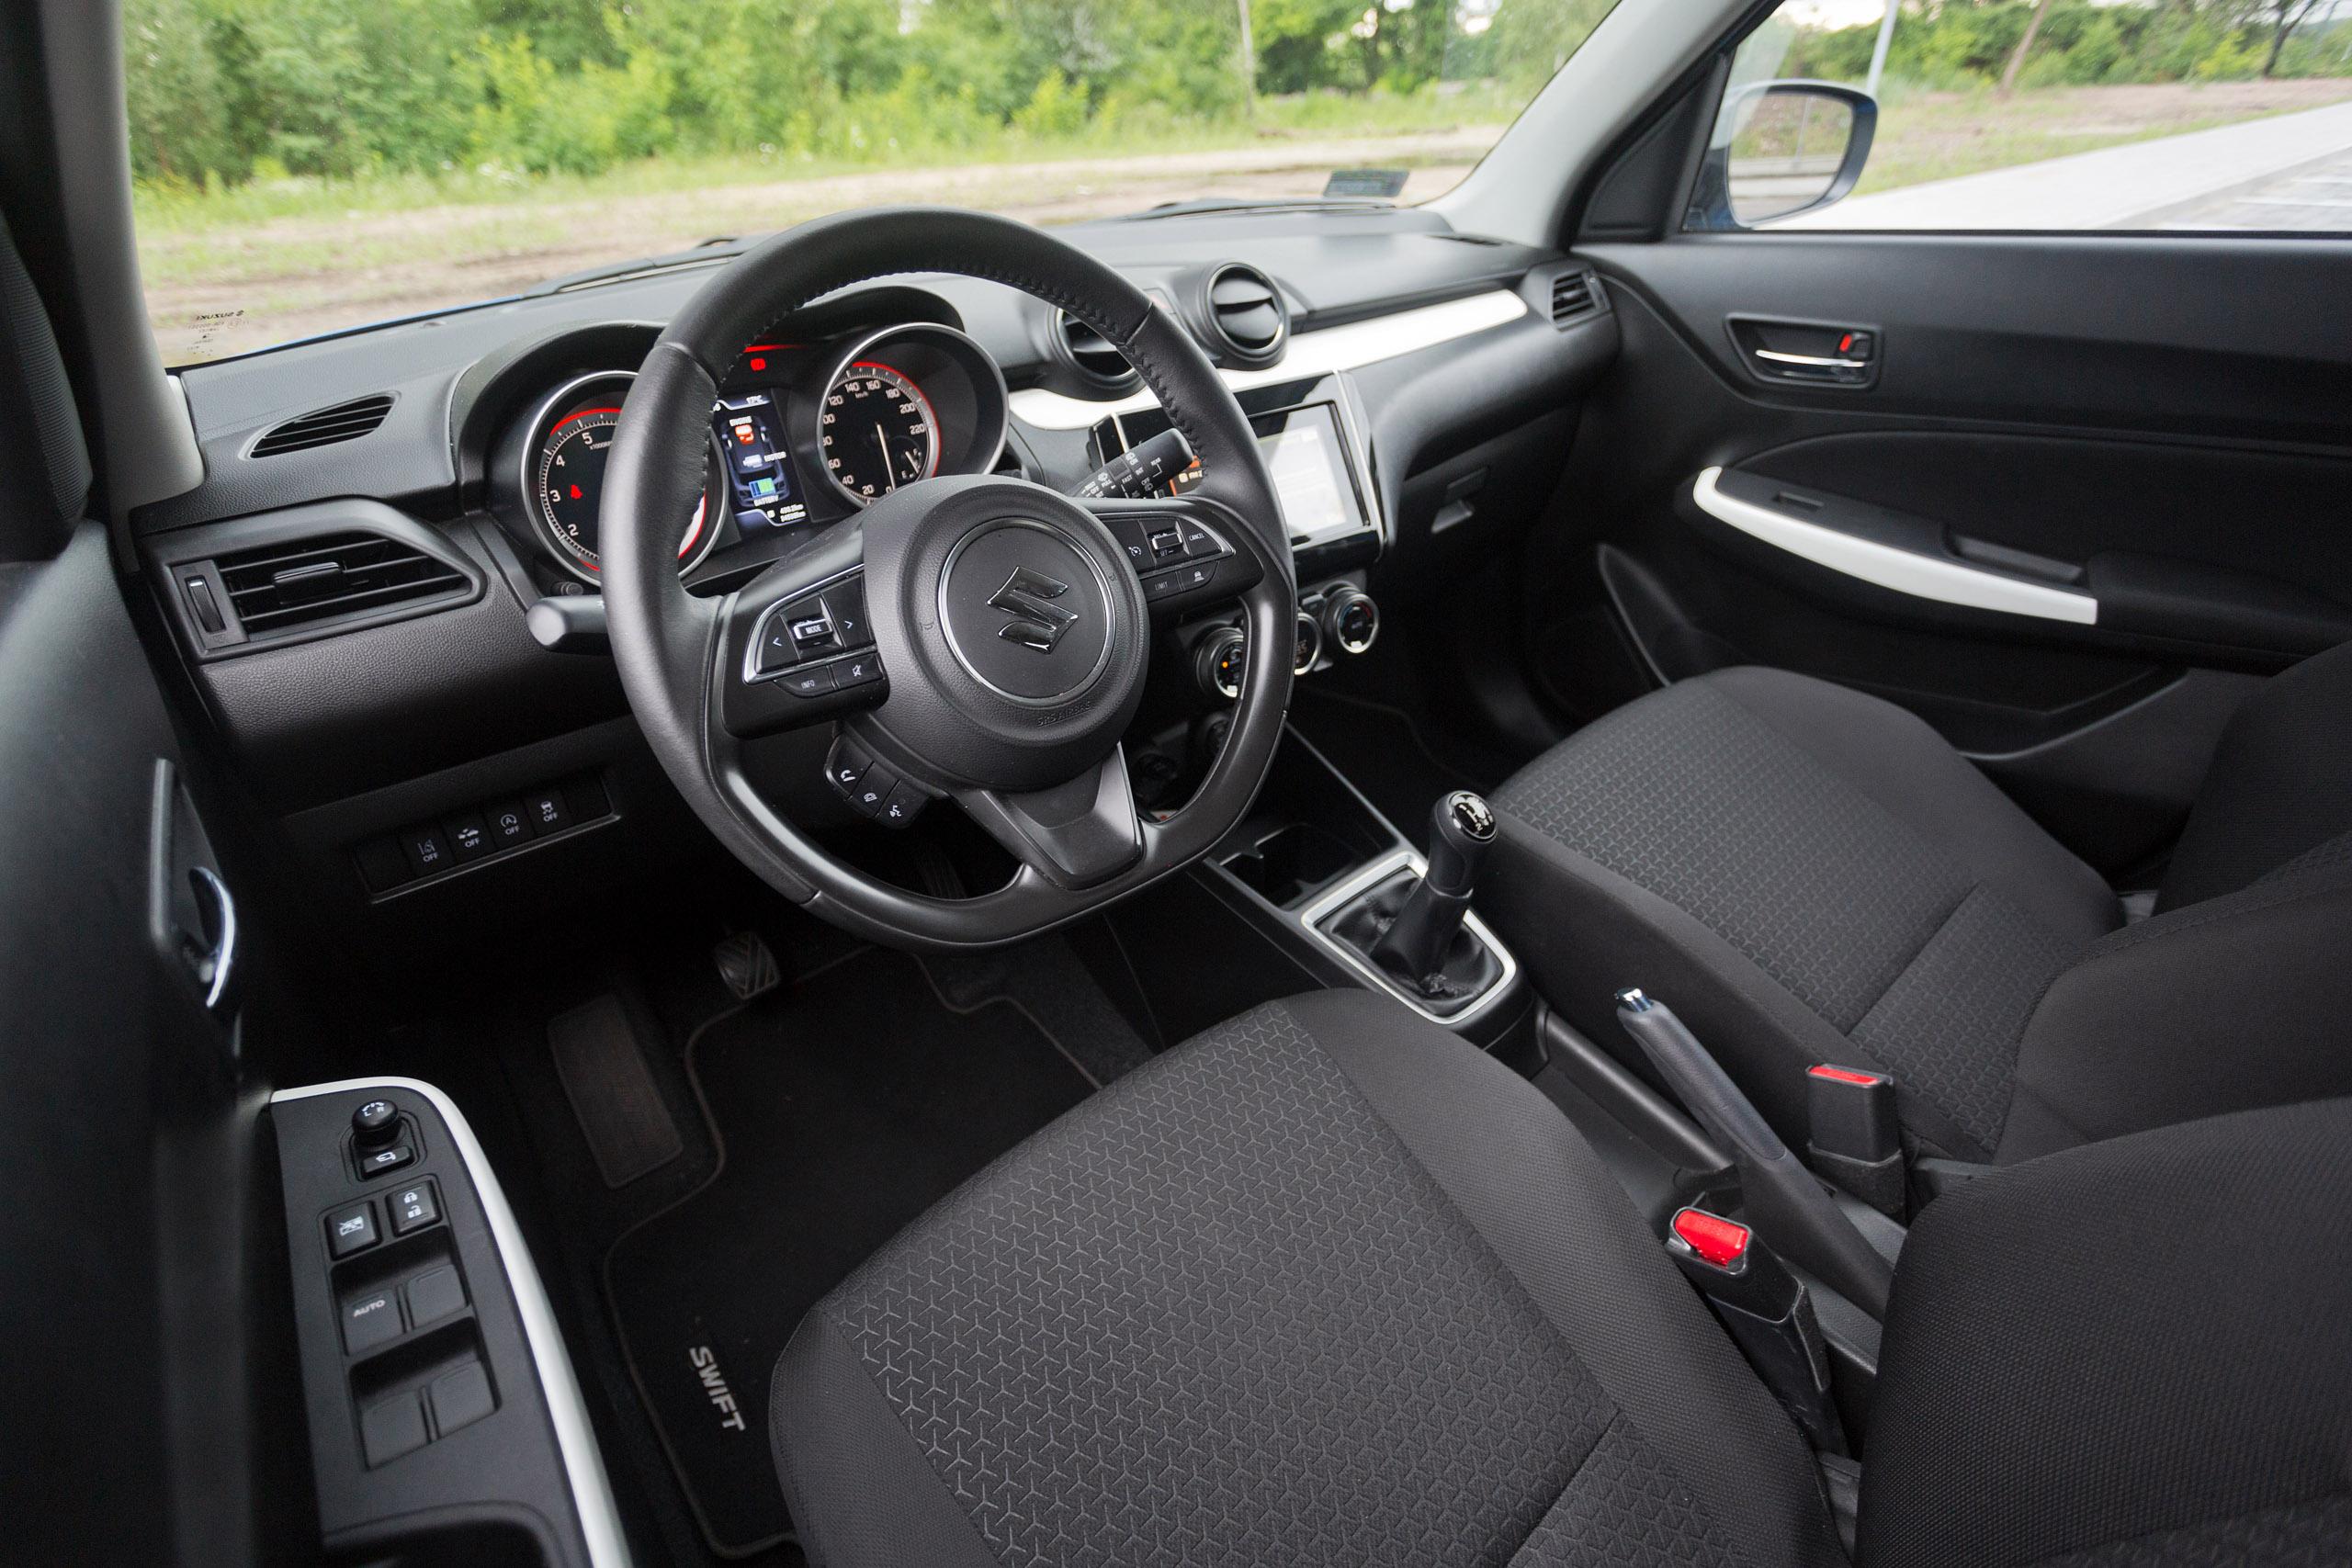 suzuki swift hybrid 1 2 dualjet shvs elegance test project automotive. Black Bedroom Furniture Sets. Home Design Ideas